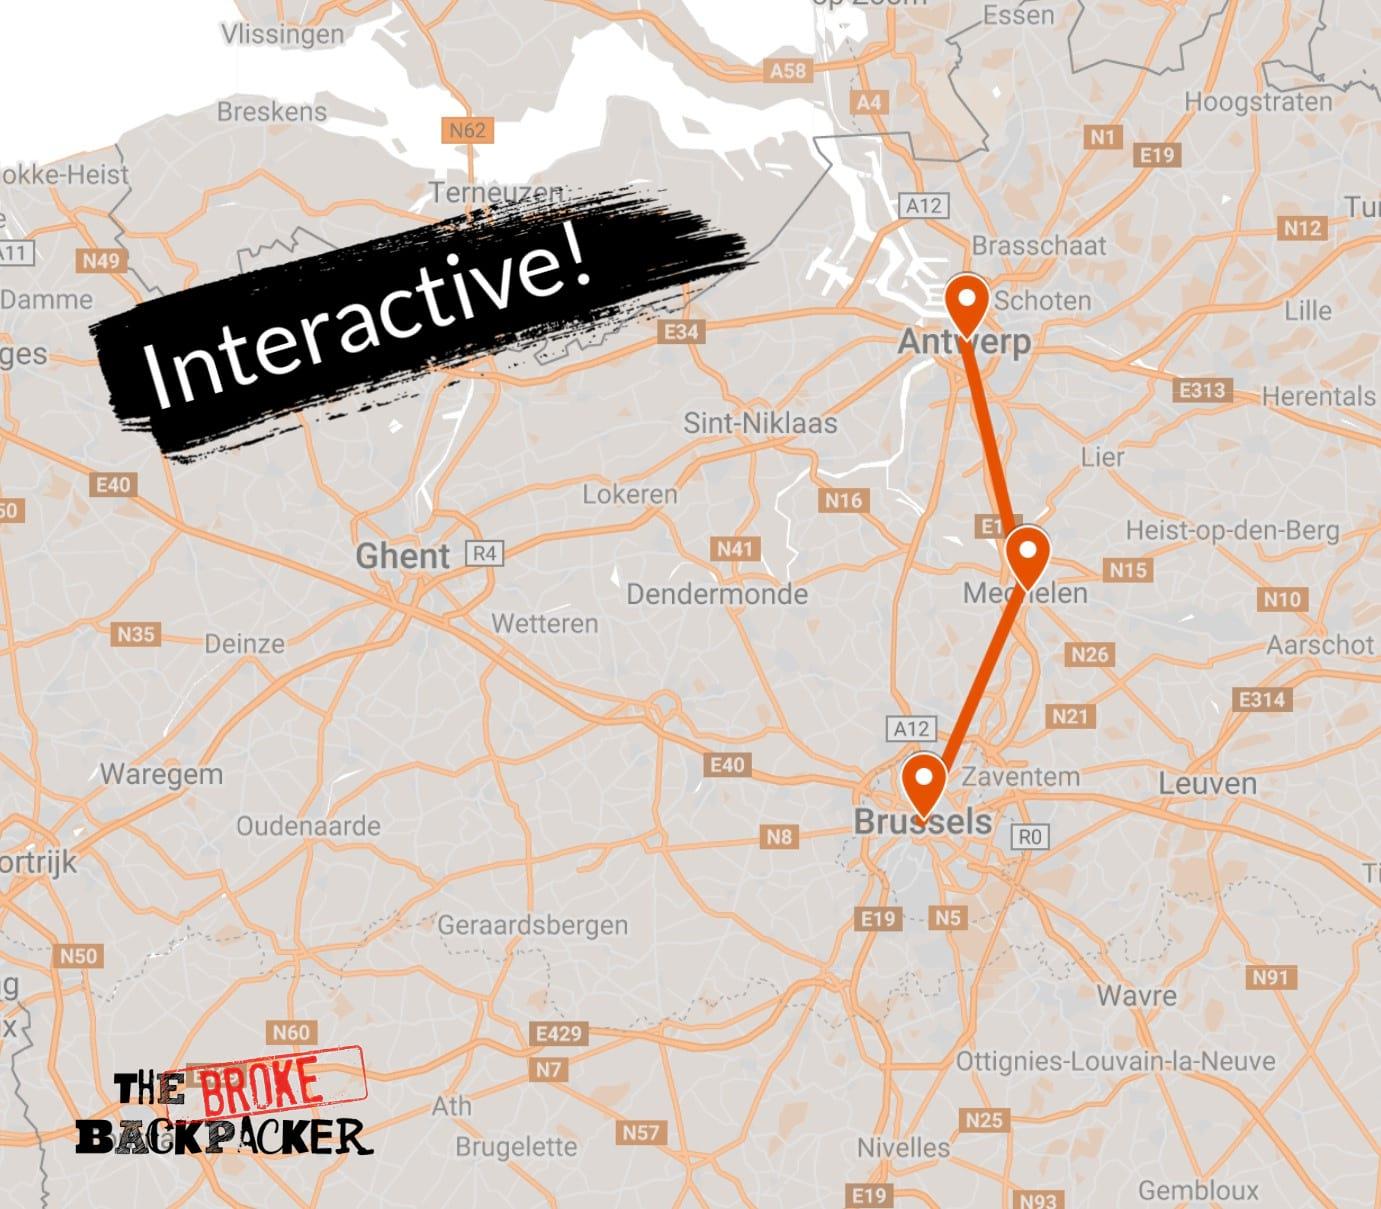 backpacking belgium map 3 days